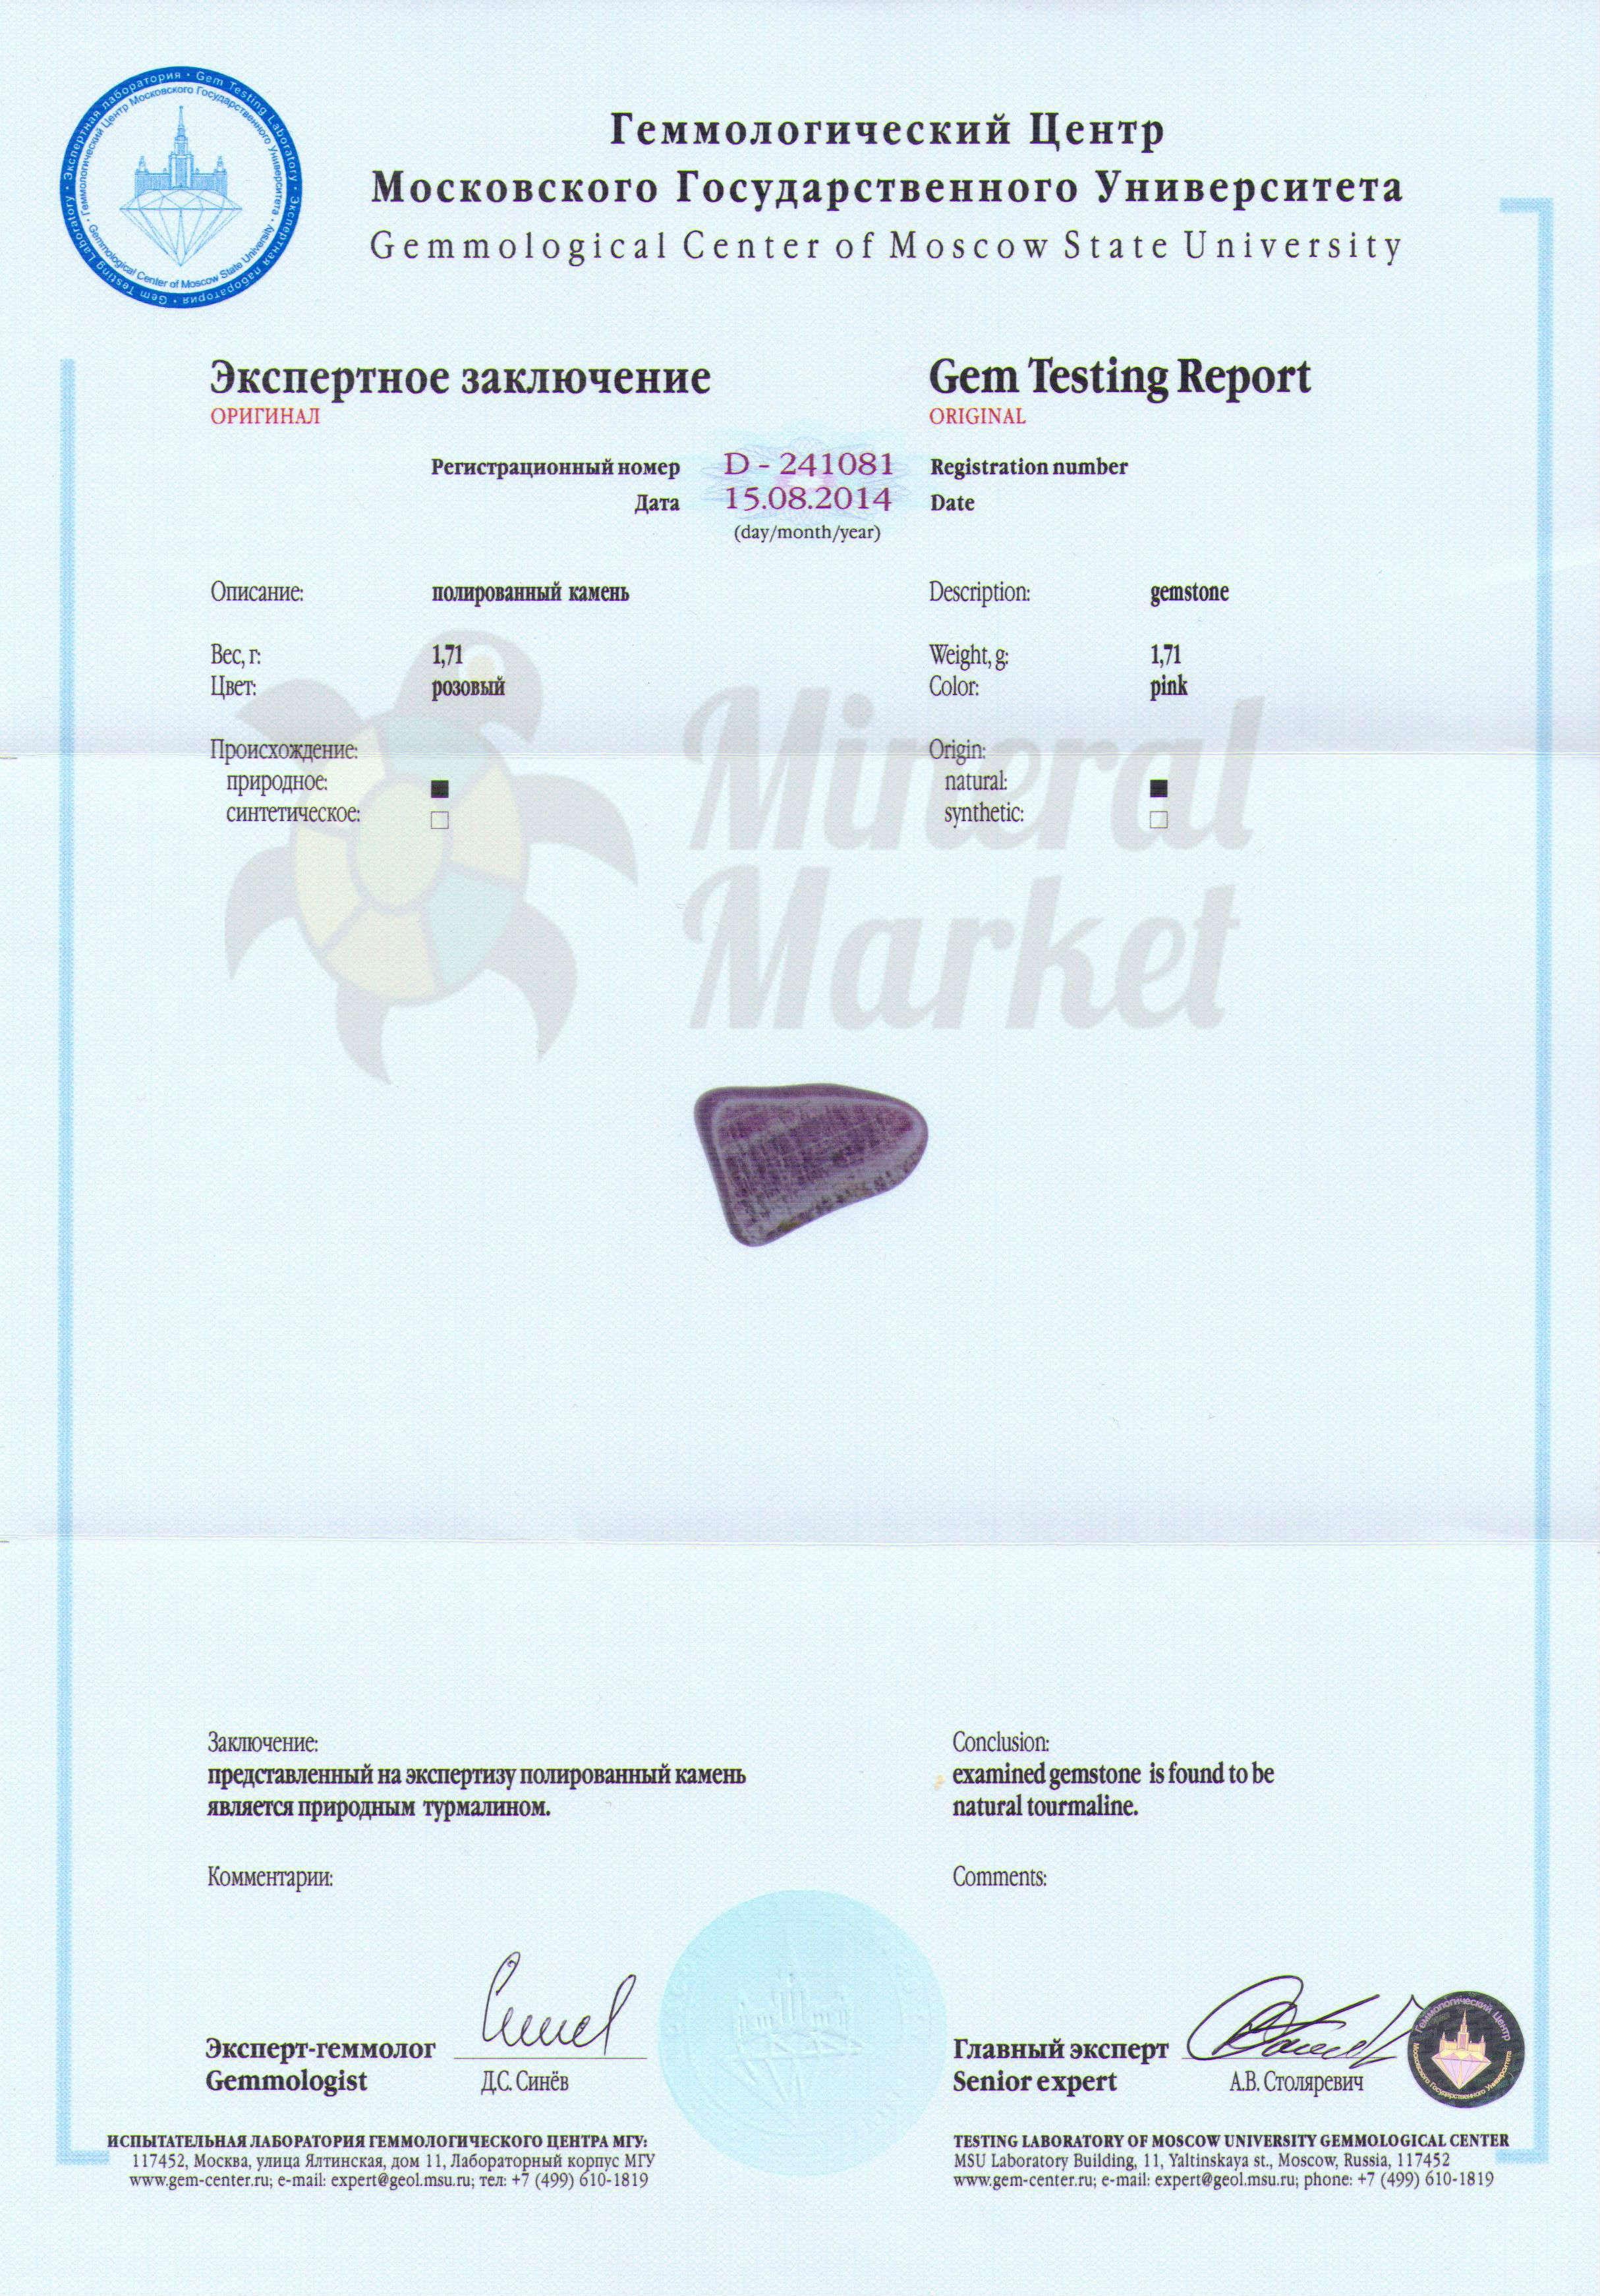 http://mineralmarket.ru/img/certificate/123.jpg